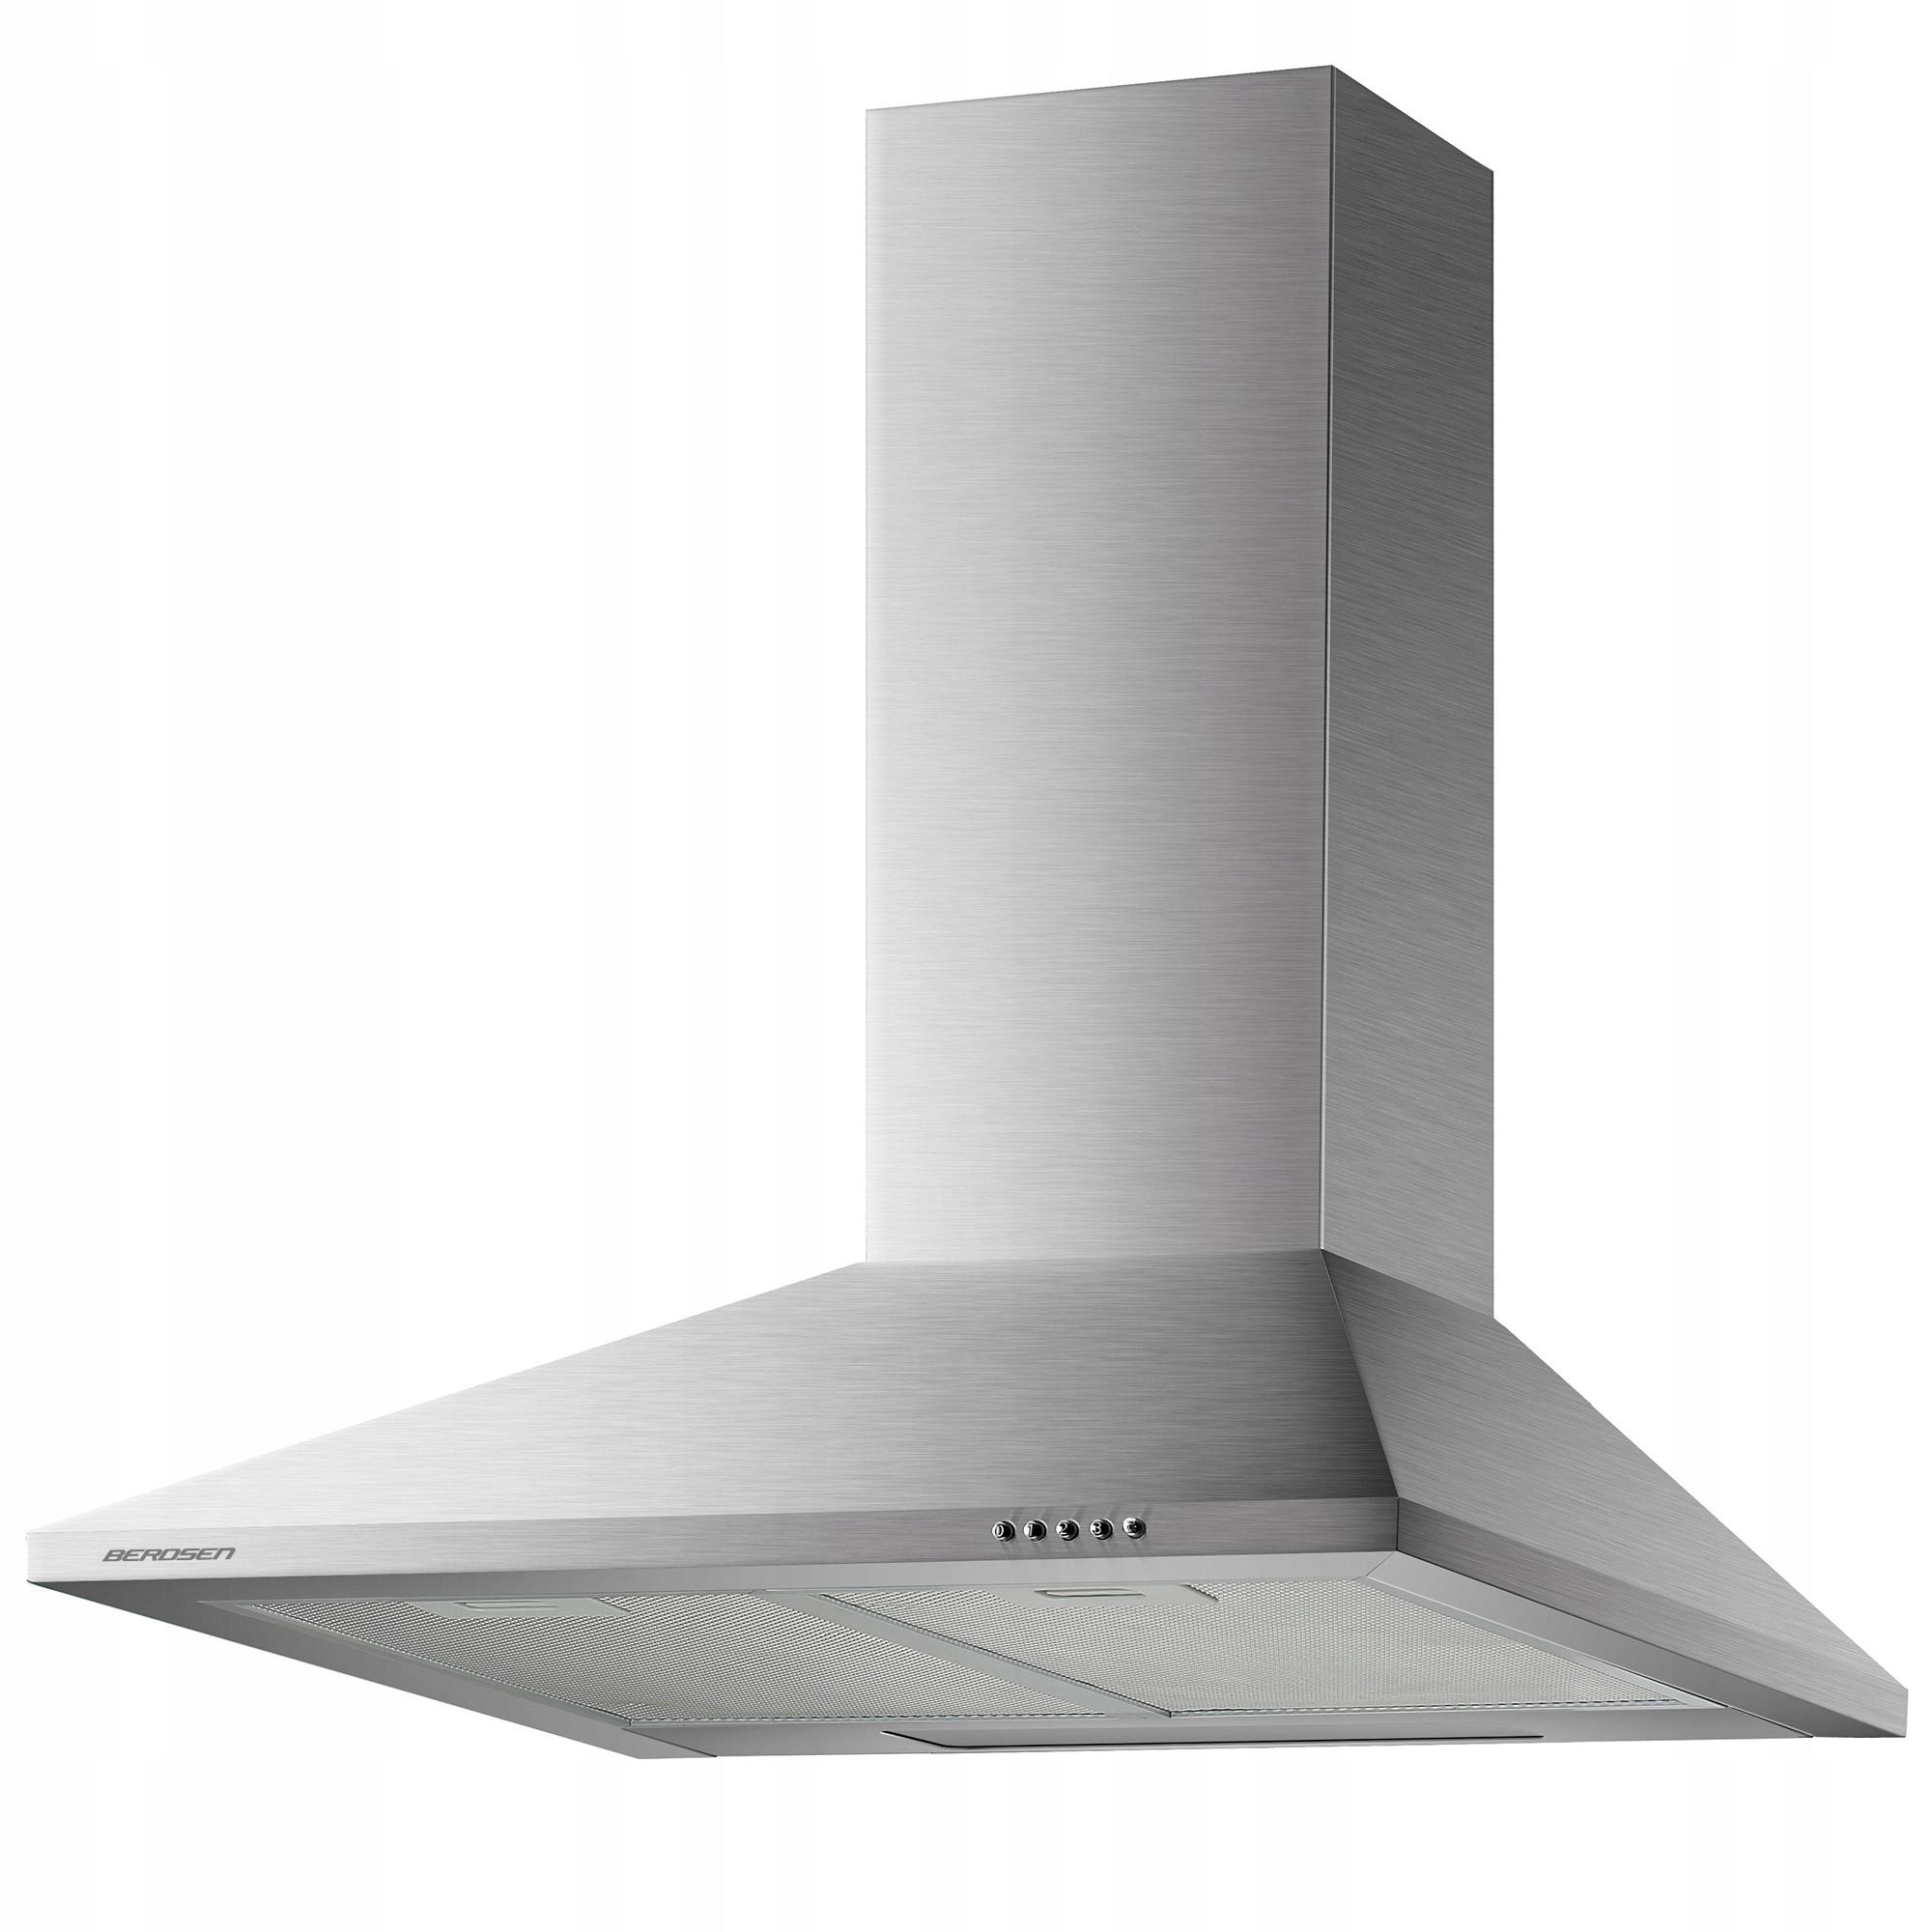 Кухонная ВЫТЯЖКА 60 см ДЫМОХОДНАЯ +ТРУБА +ДЫМОХОД BT-213